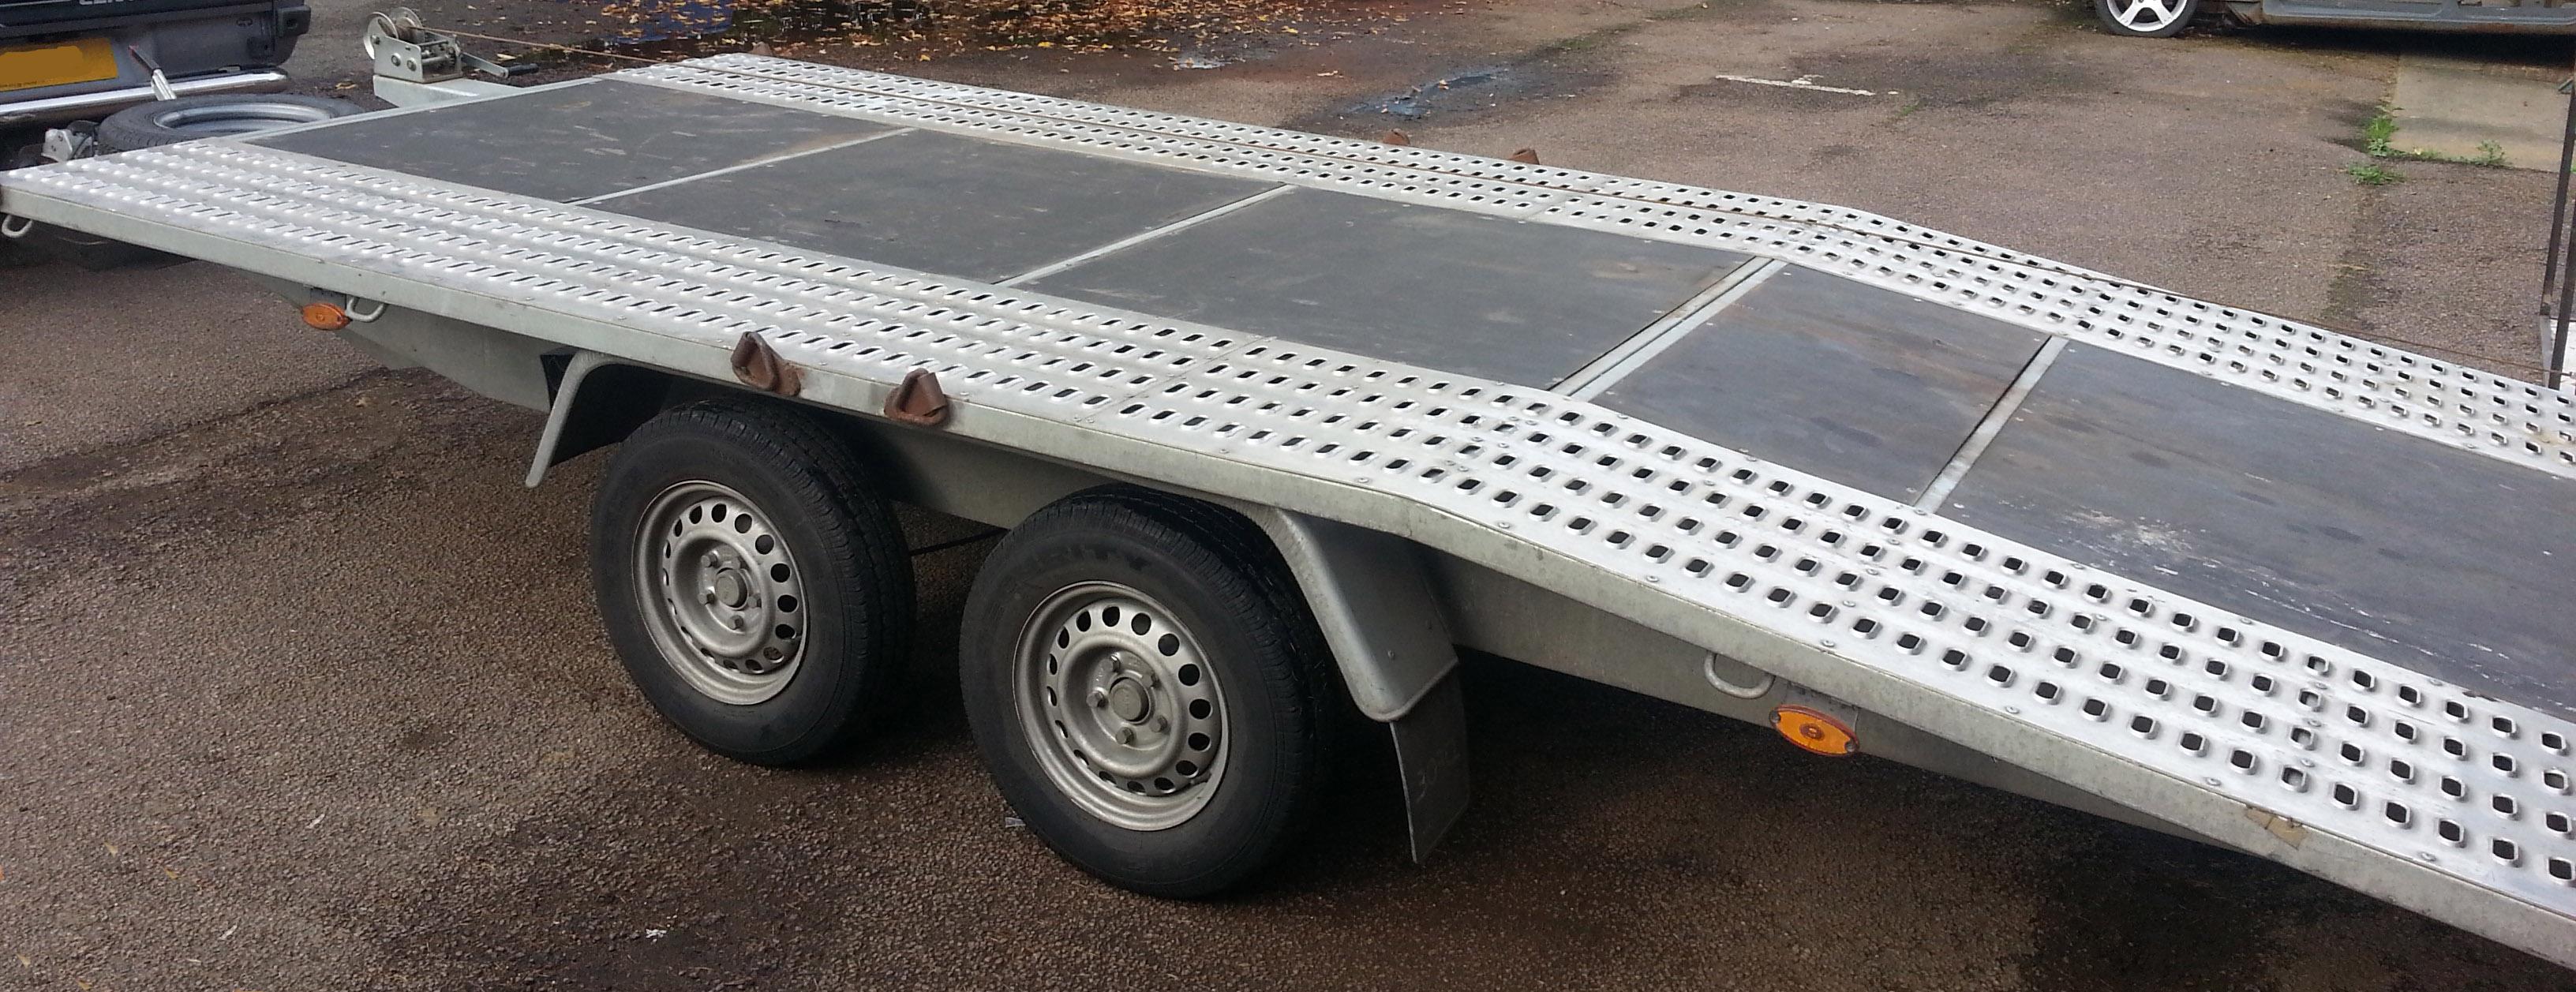 Lot 36 - BORO Model E946.0039 Galvanised Steel Beavertail Twin Axle 4.5M Long Flatbed Vehicle Trailer,